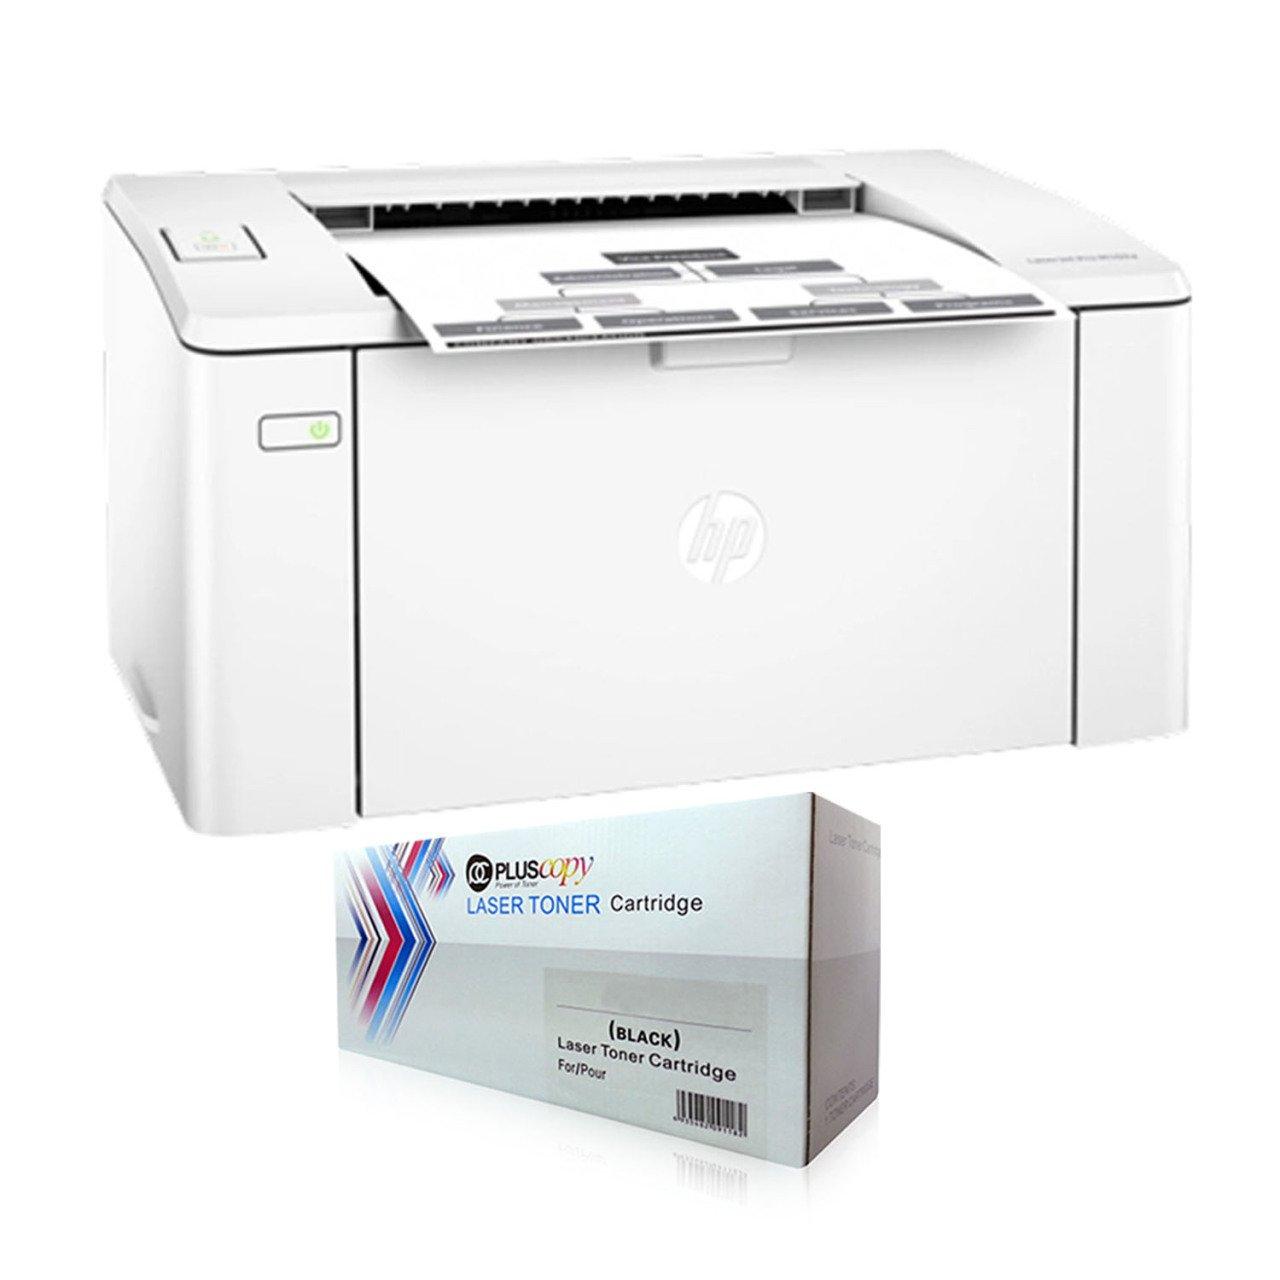 Hp Laserjet Pro M102a A4 Printer G3q34a Full Pluscopy Tonerli Toner Cartridges Aliexpress